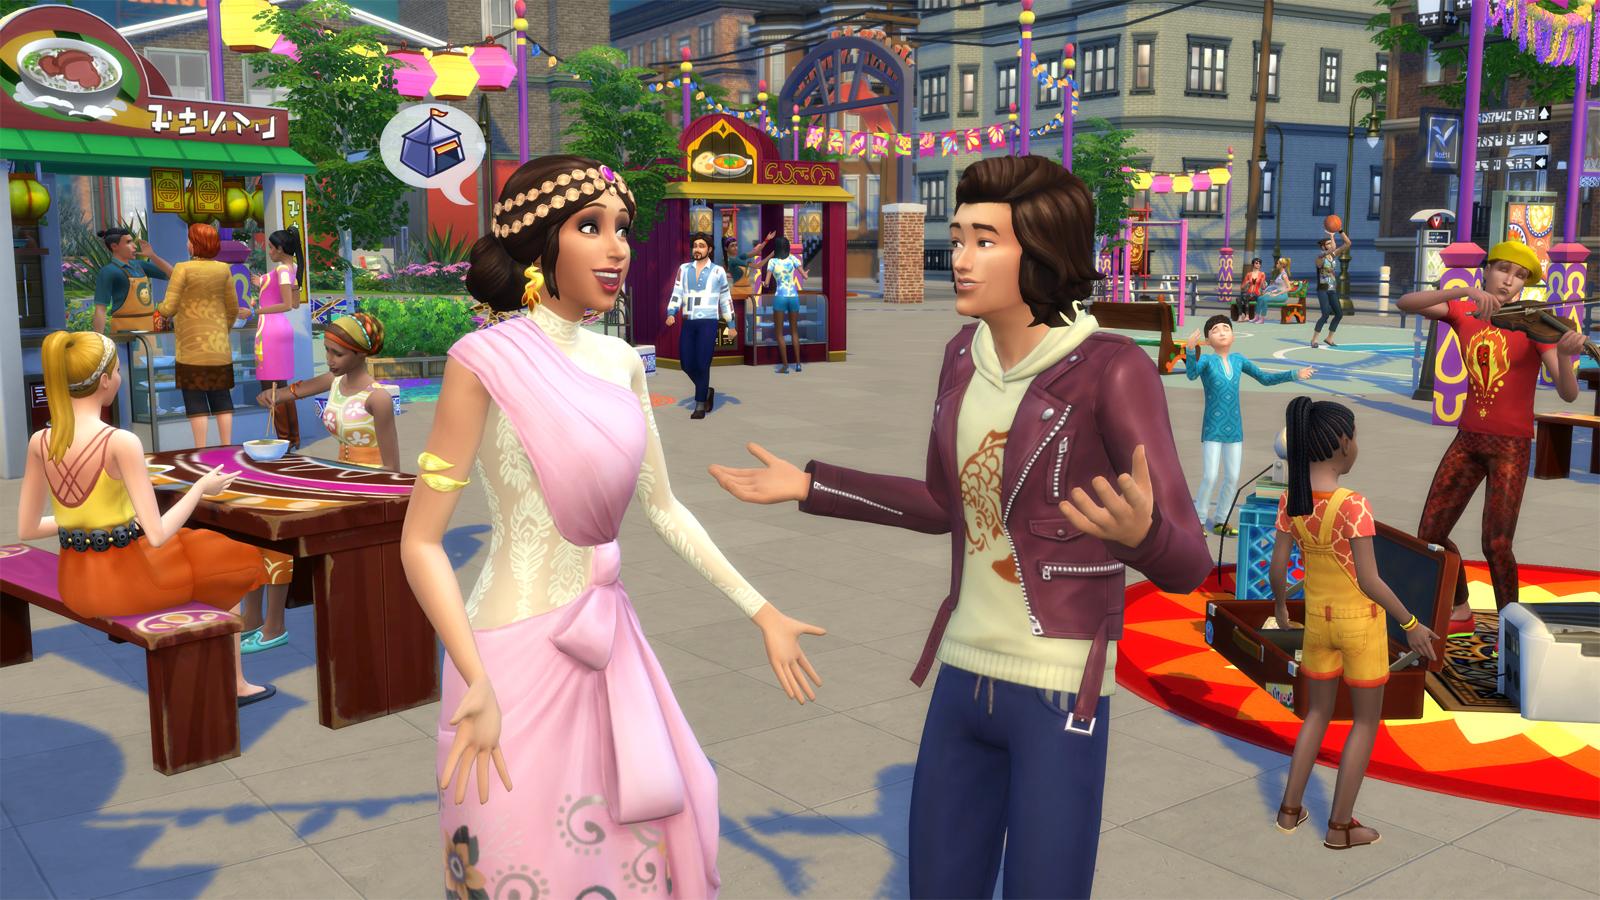 Sims 2 pack d'articles de style teen